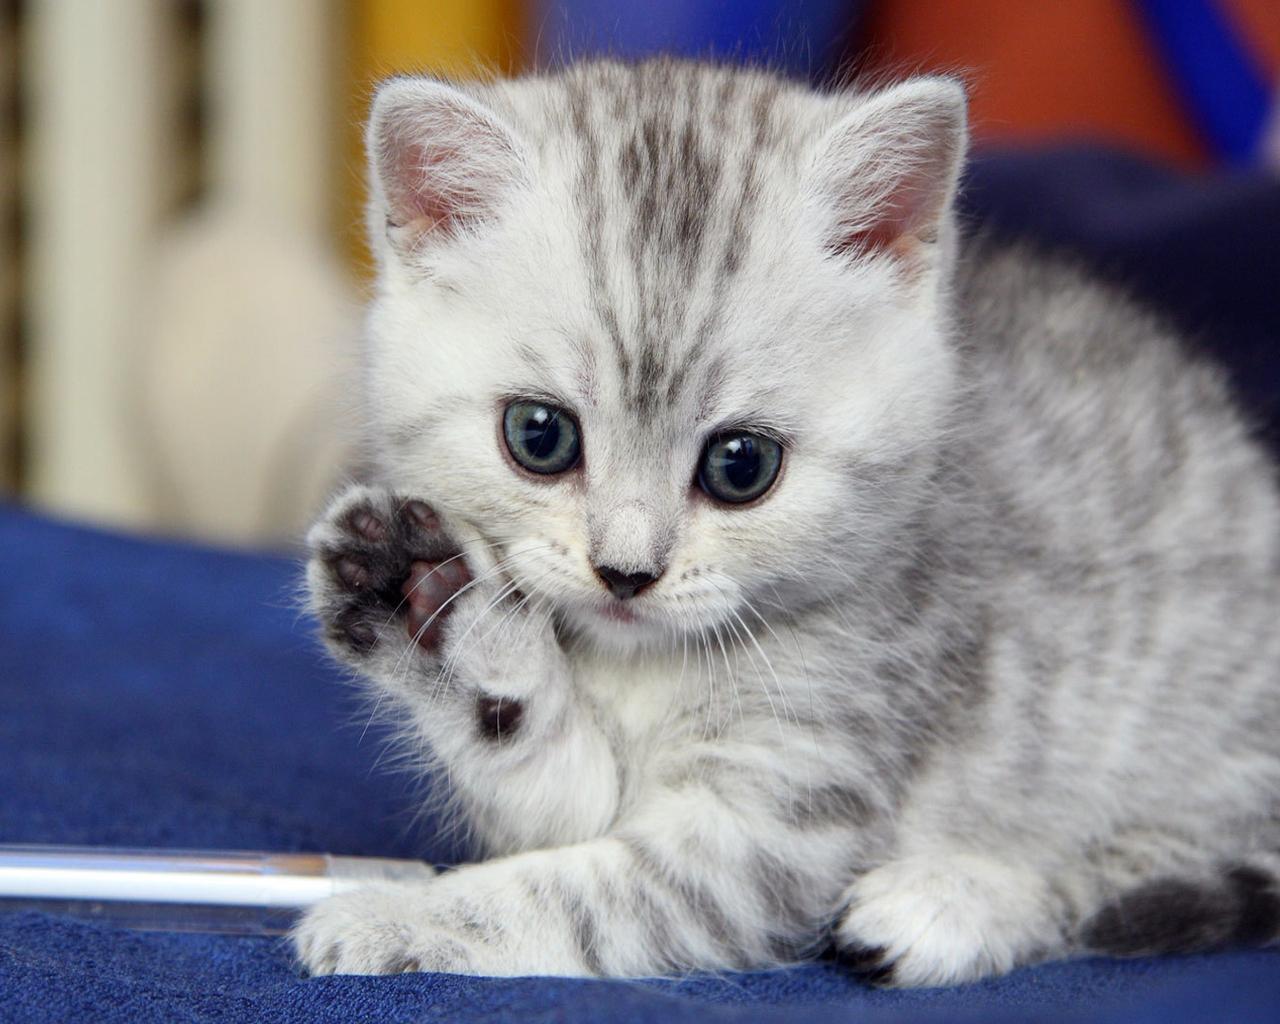 cute kitten saying hello 1280x1024